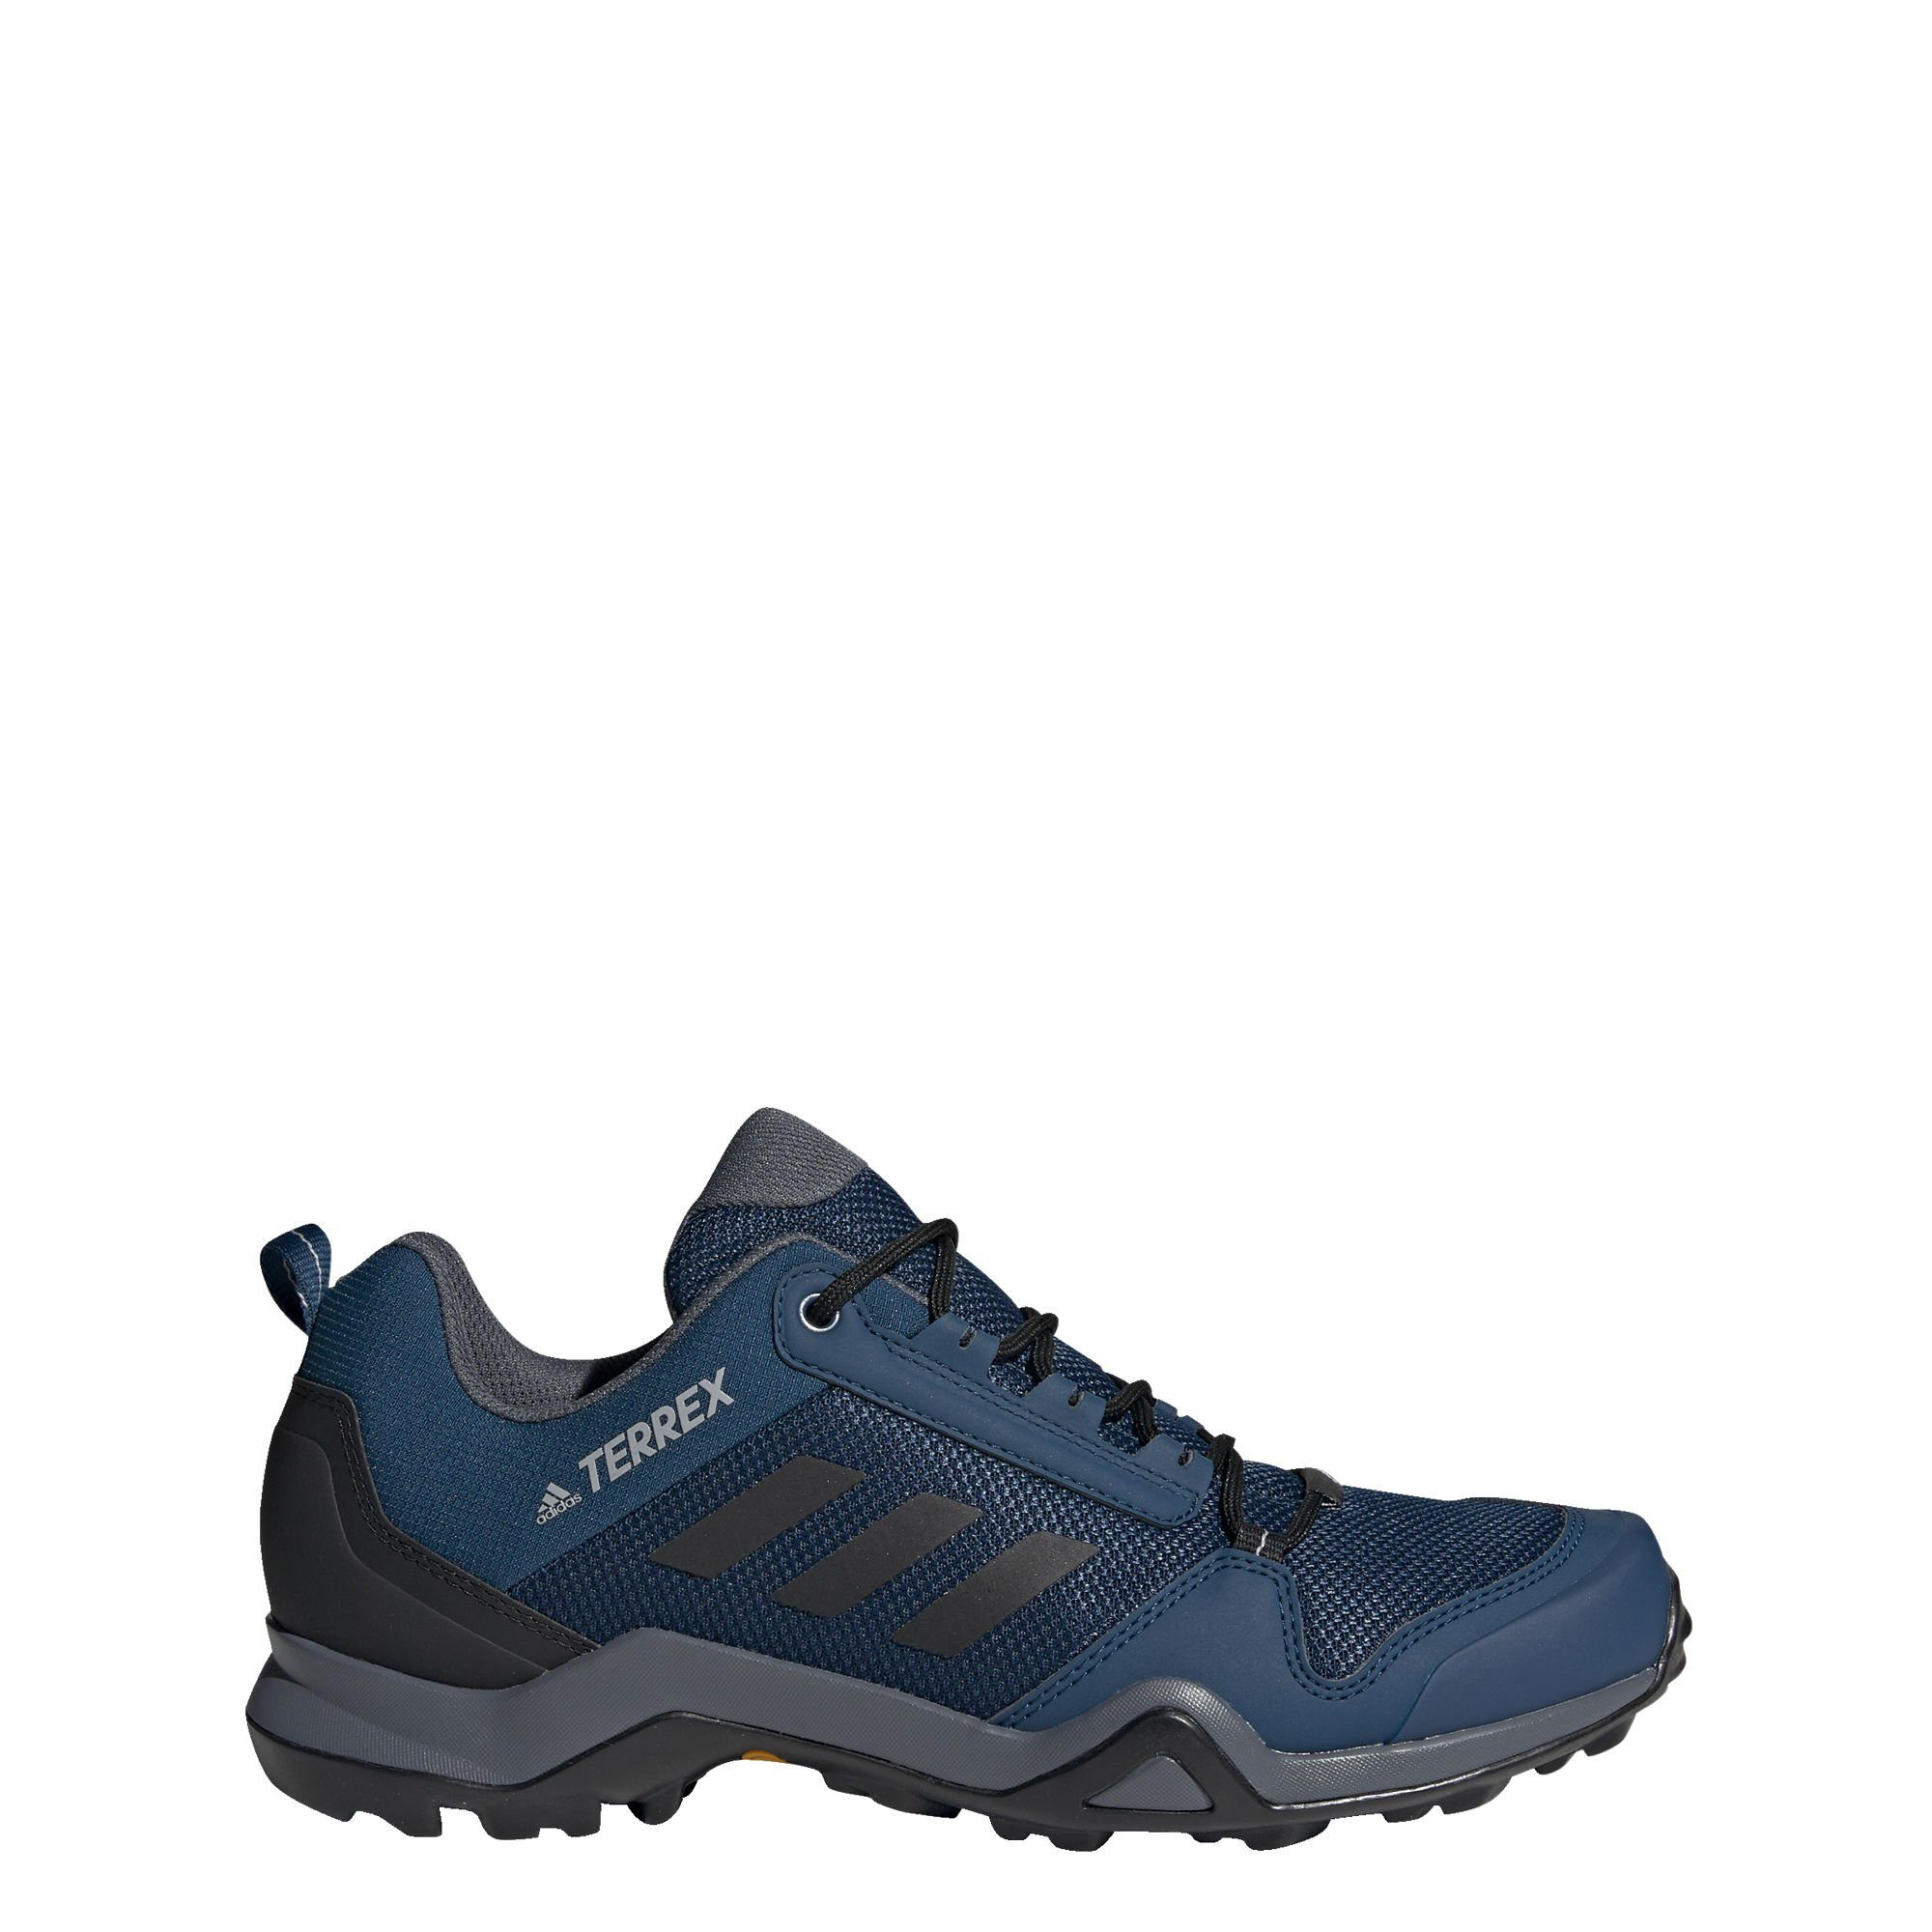 adidas terrex ax2 rw trailrunning schuhe